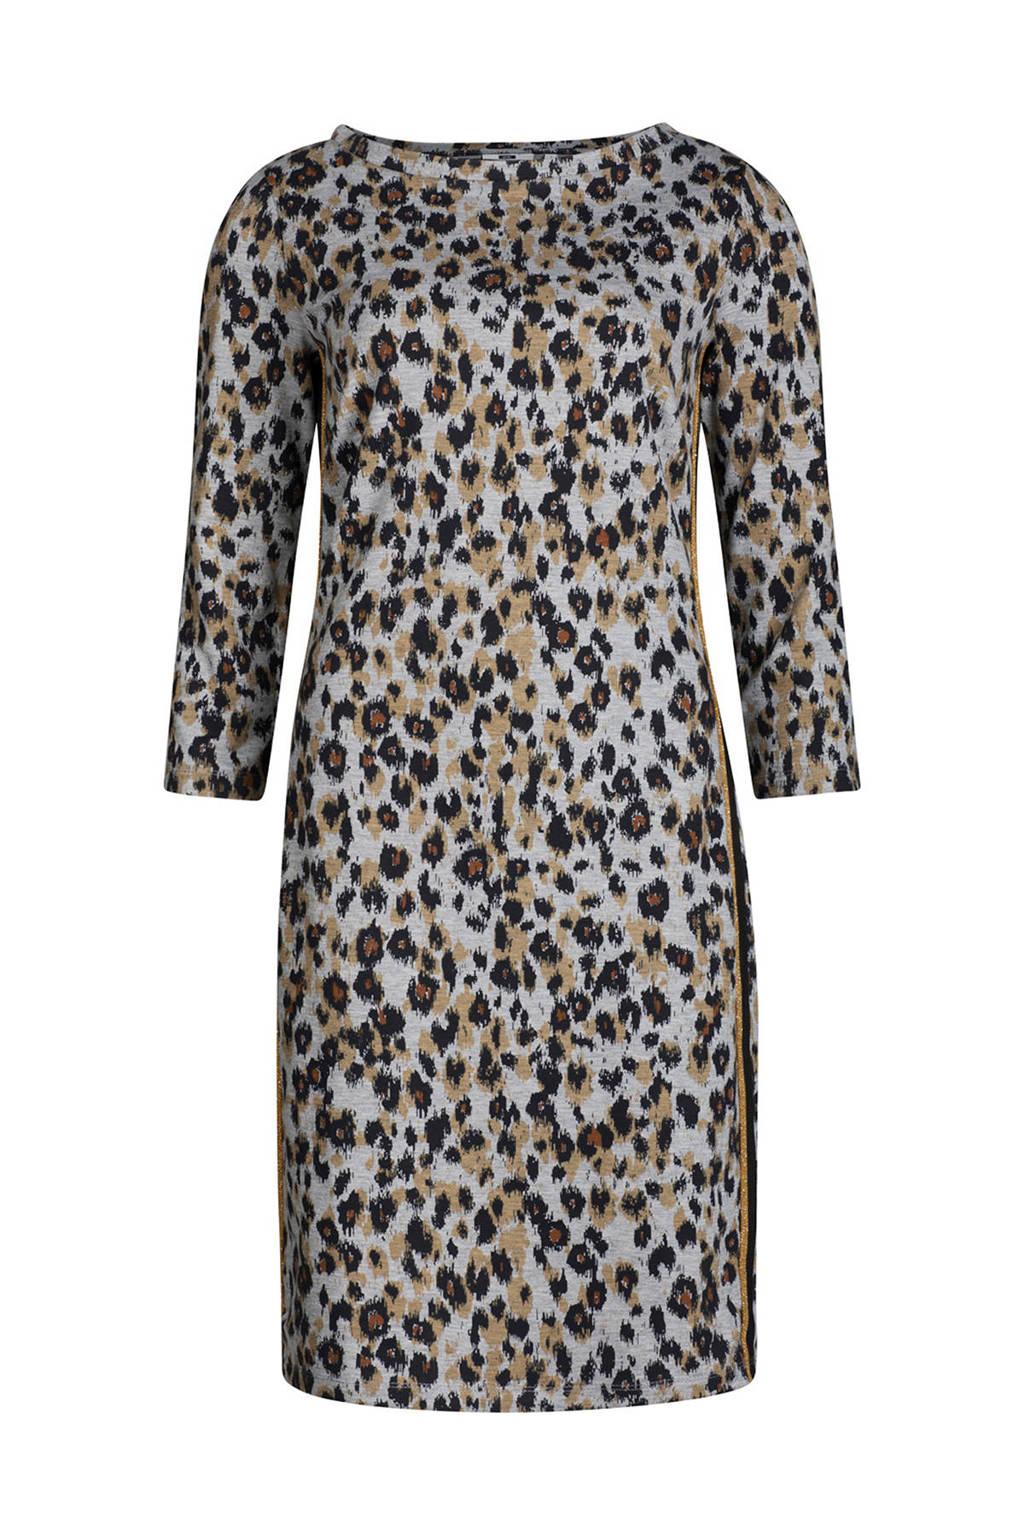 WE Fashion jurk met panterprint grijs, Grijs/zwart